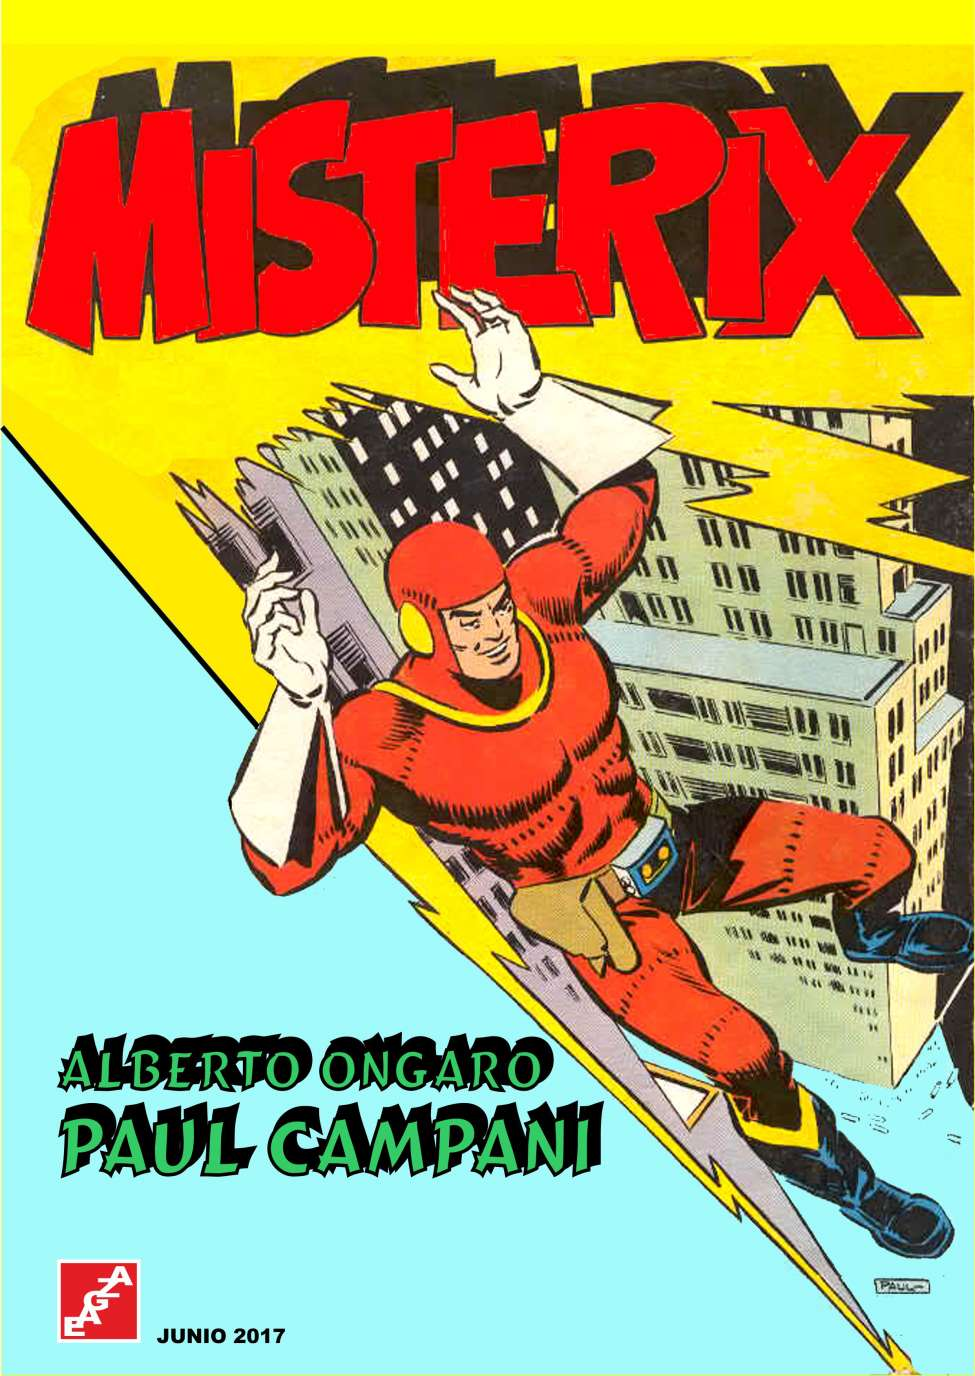 Comic Book Cover For Misterix - A. Ongaro - P. Campani - EAGZA